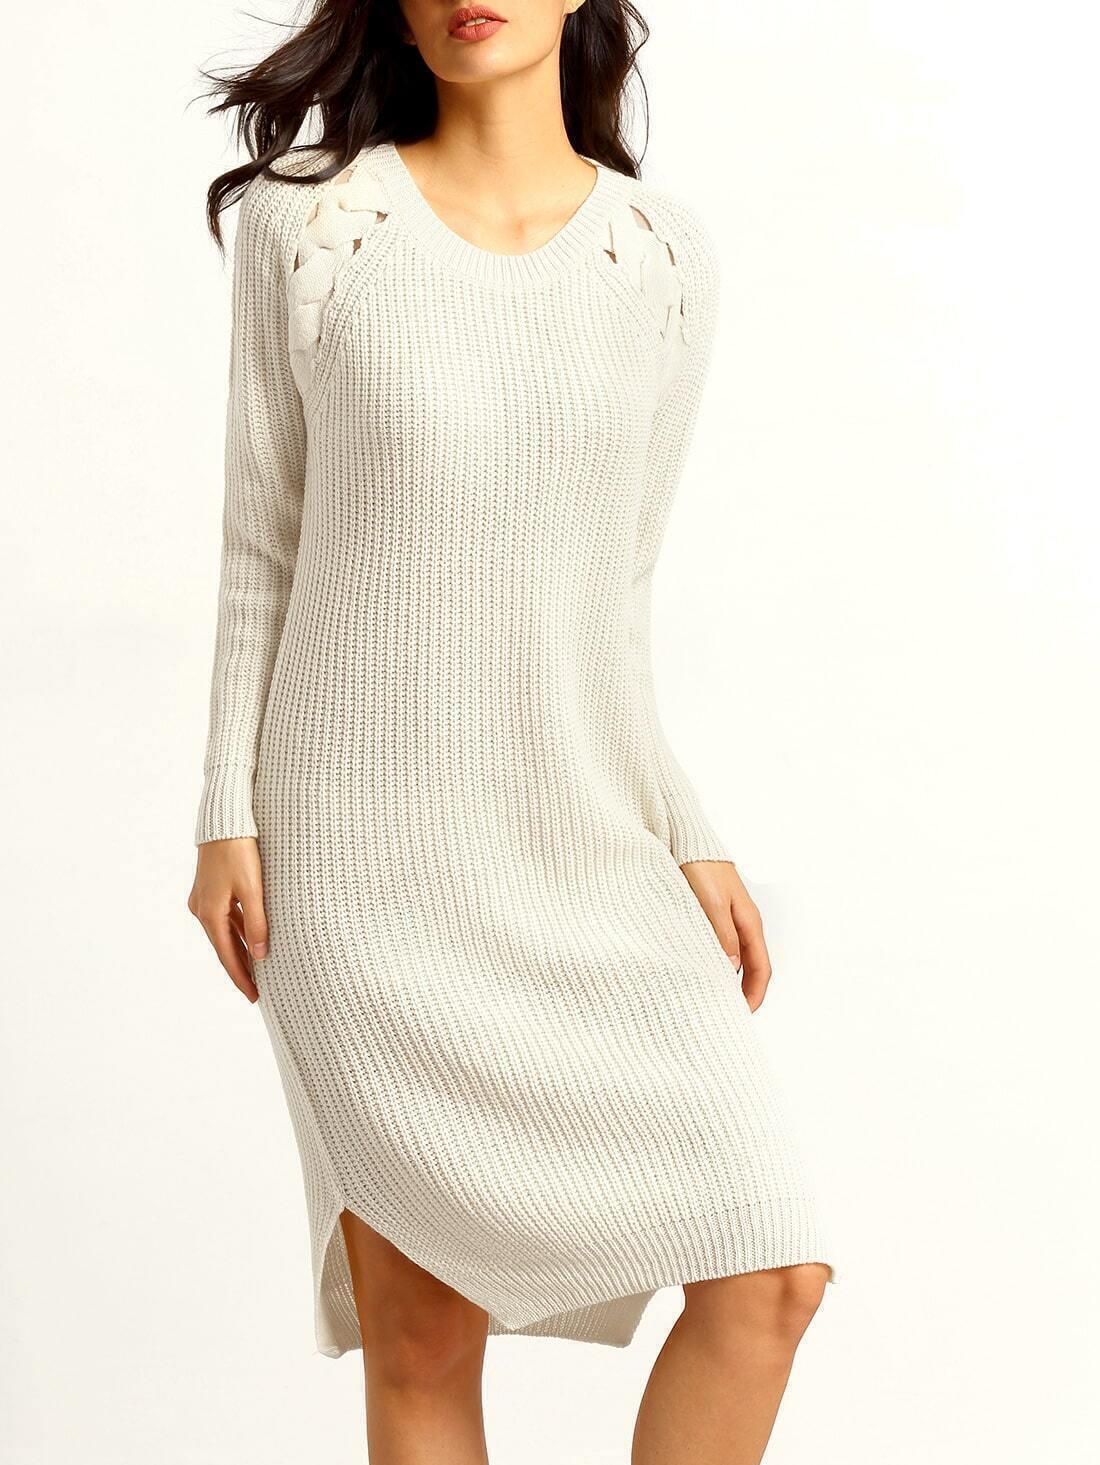 Long Sleeve Hollow Side Slit High Low Dress - $19.00